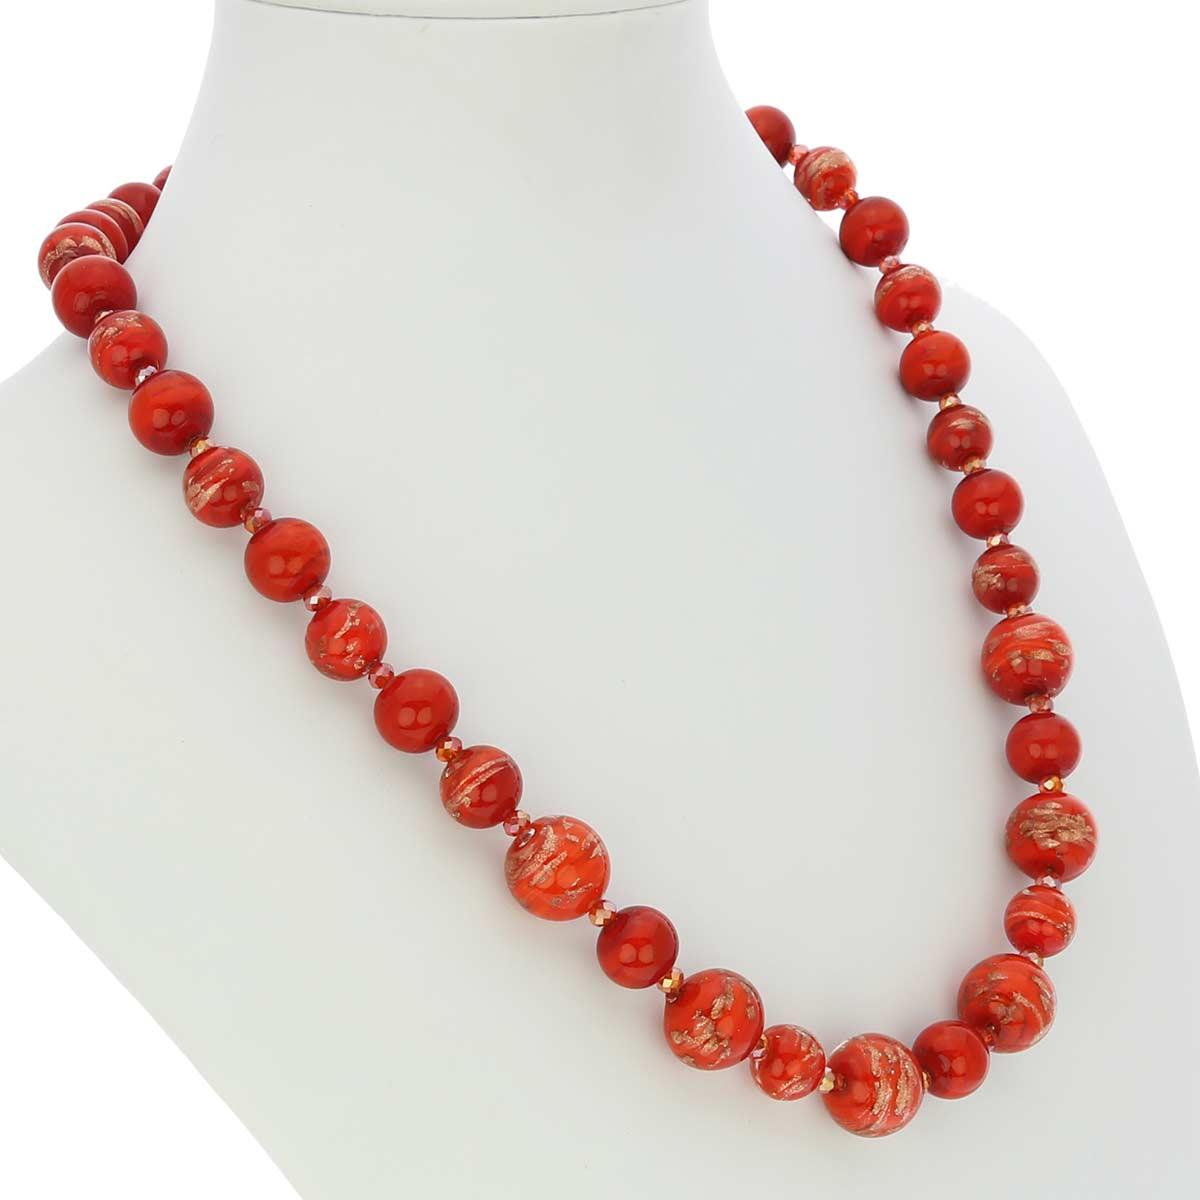 Starlight Murano Necklace - Fire Red